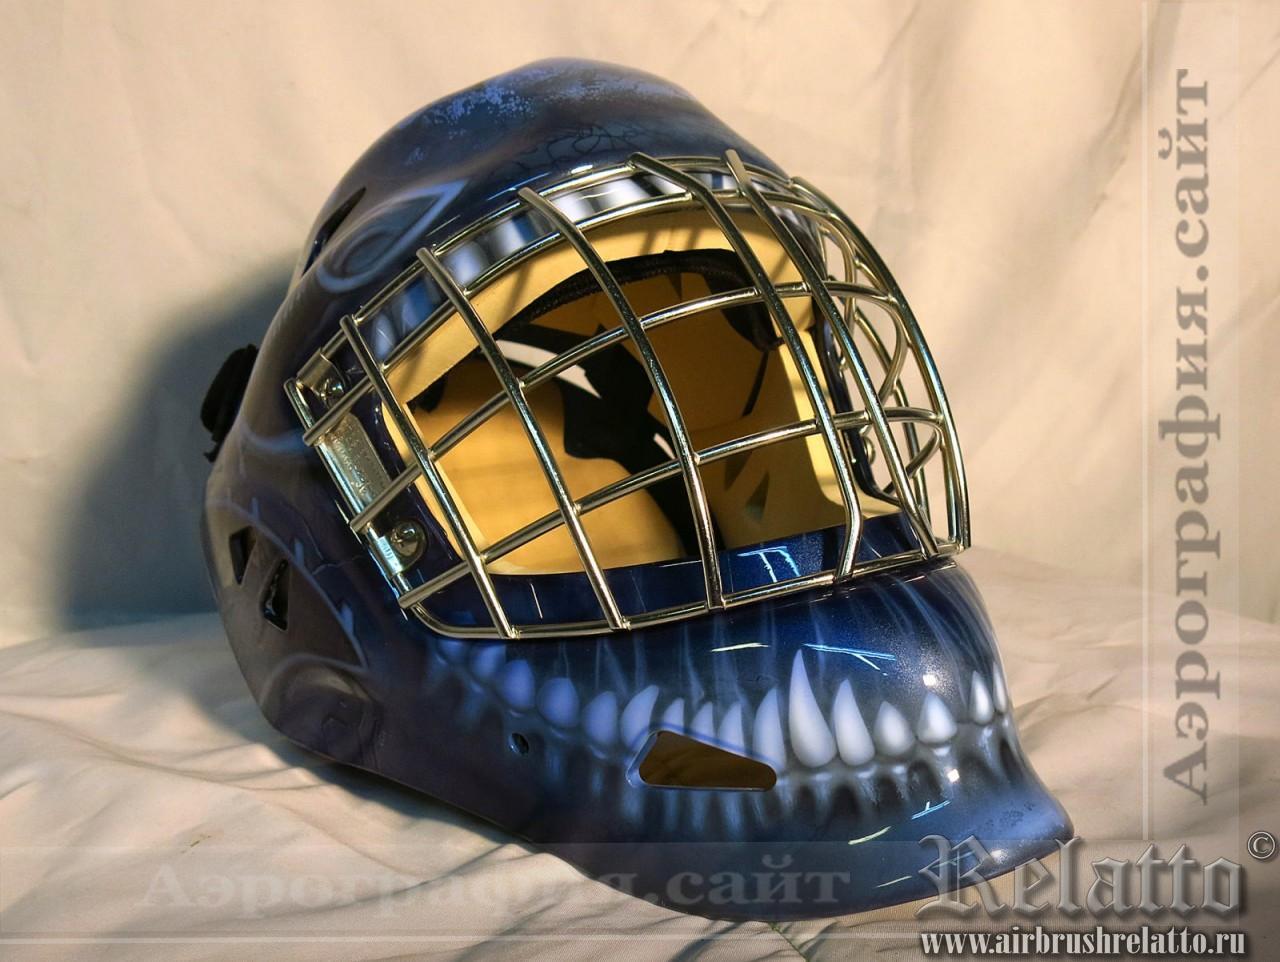 Роспись вратарского хоккейного шлема